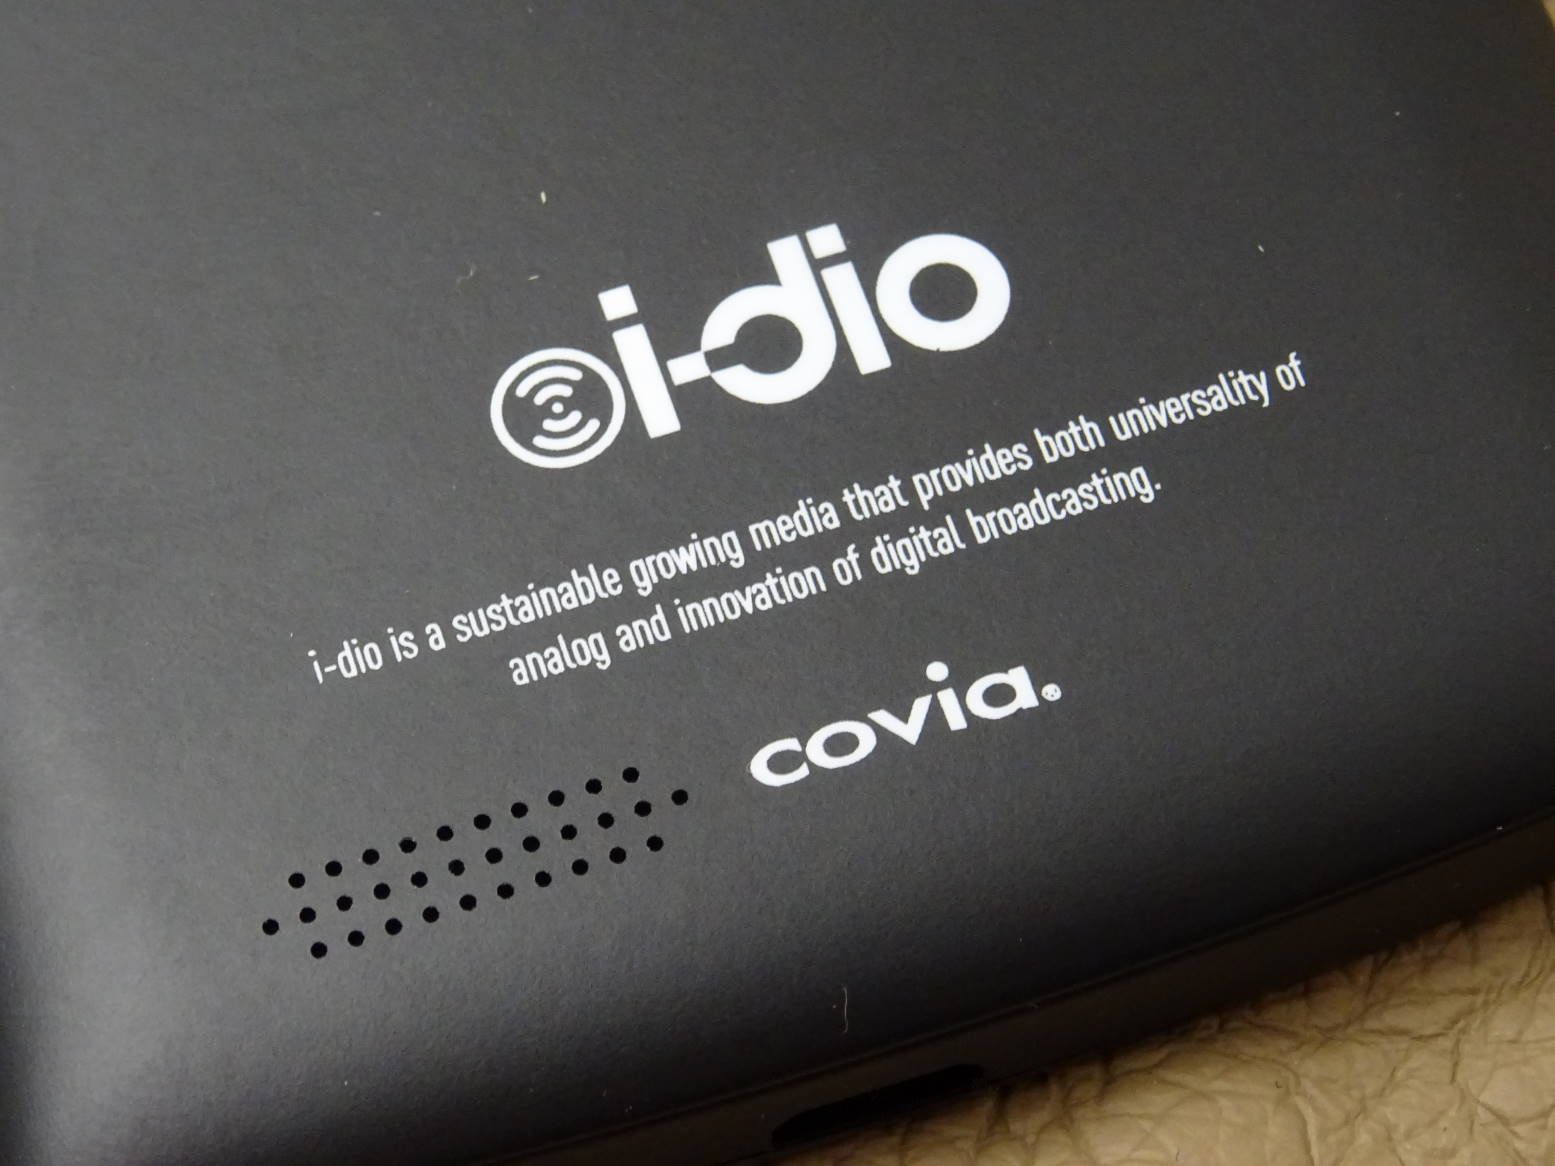 covia i-dio Phone CP-VL5A 専用保護シートは4タイプ!(OverLay)